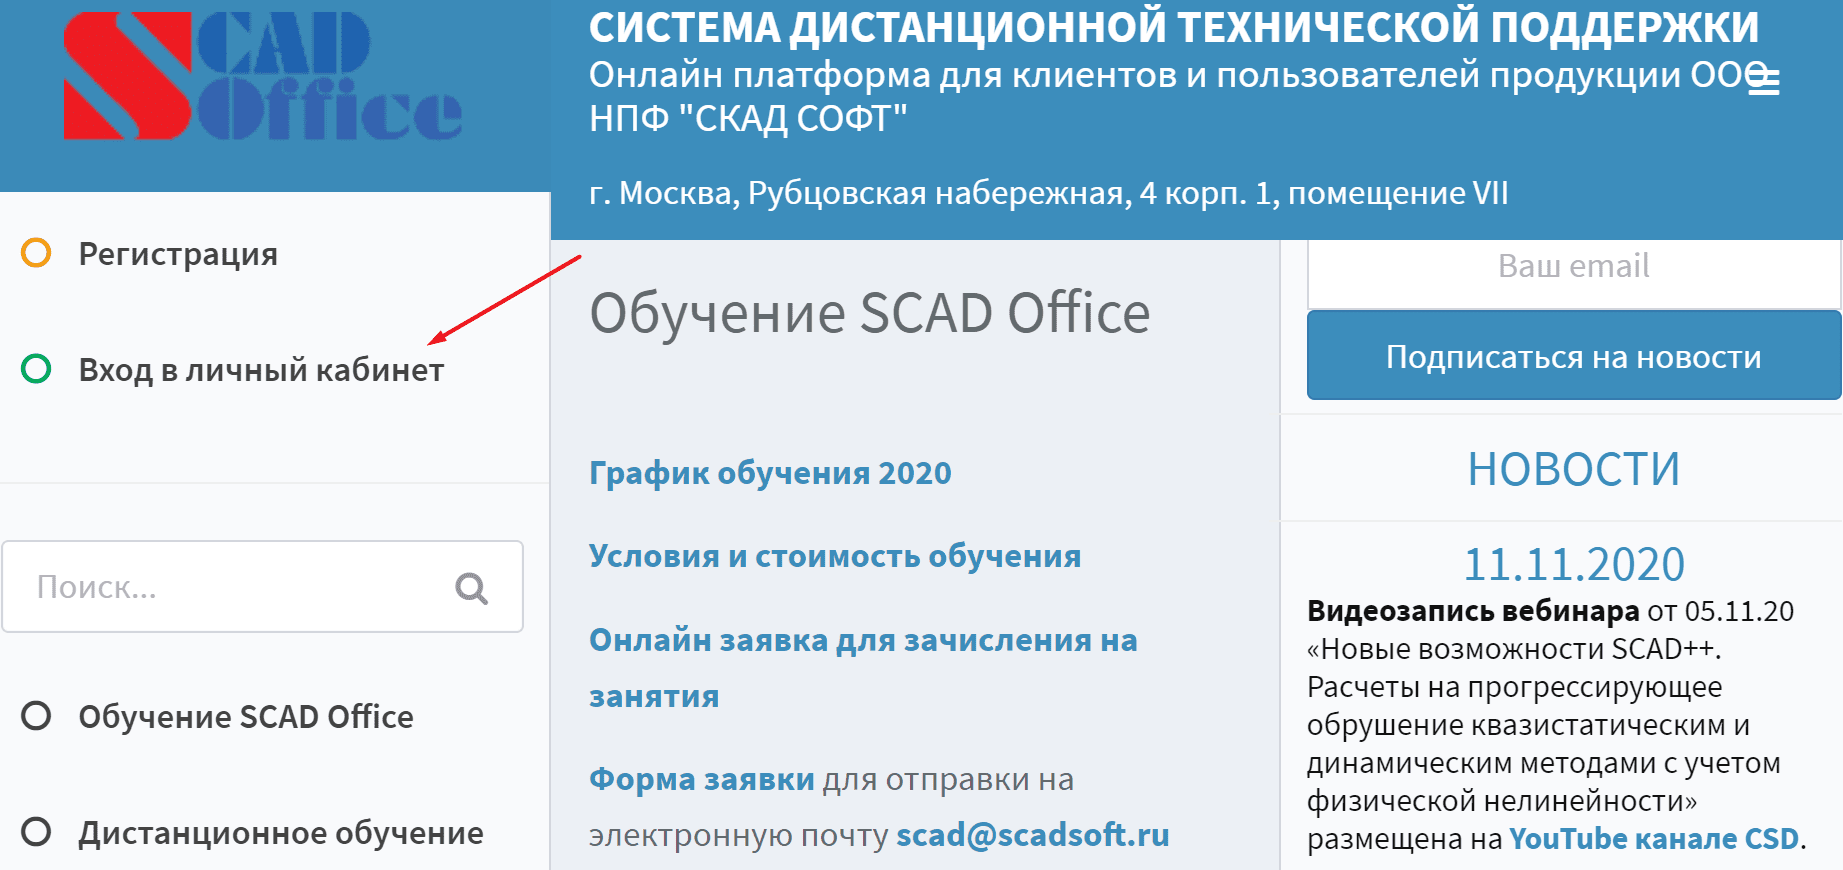 Сайт SCAD HELP